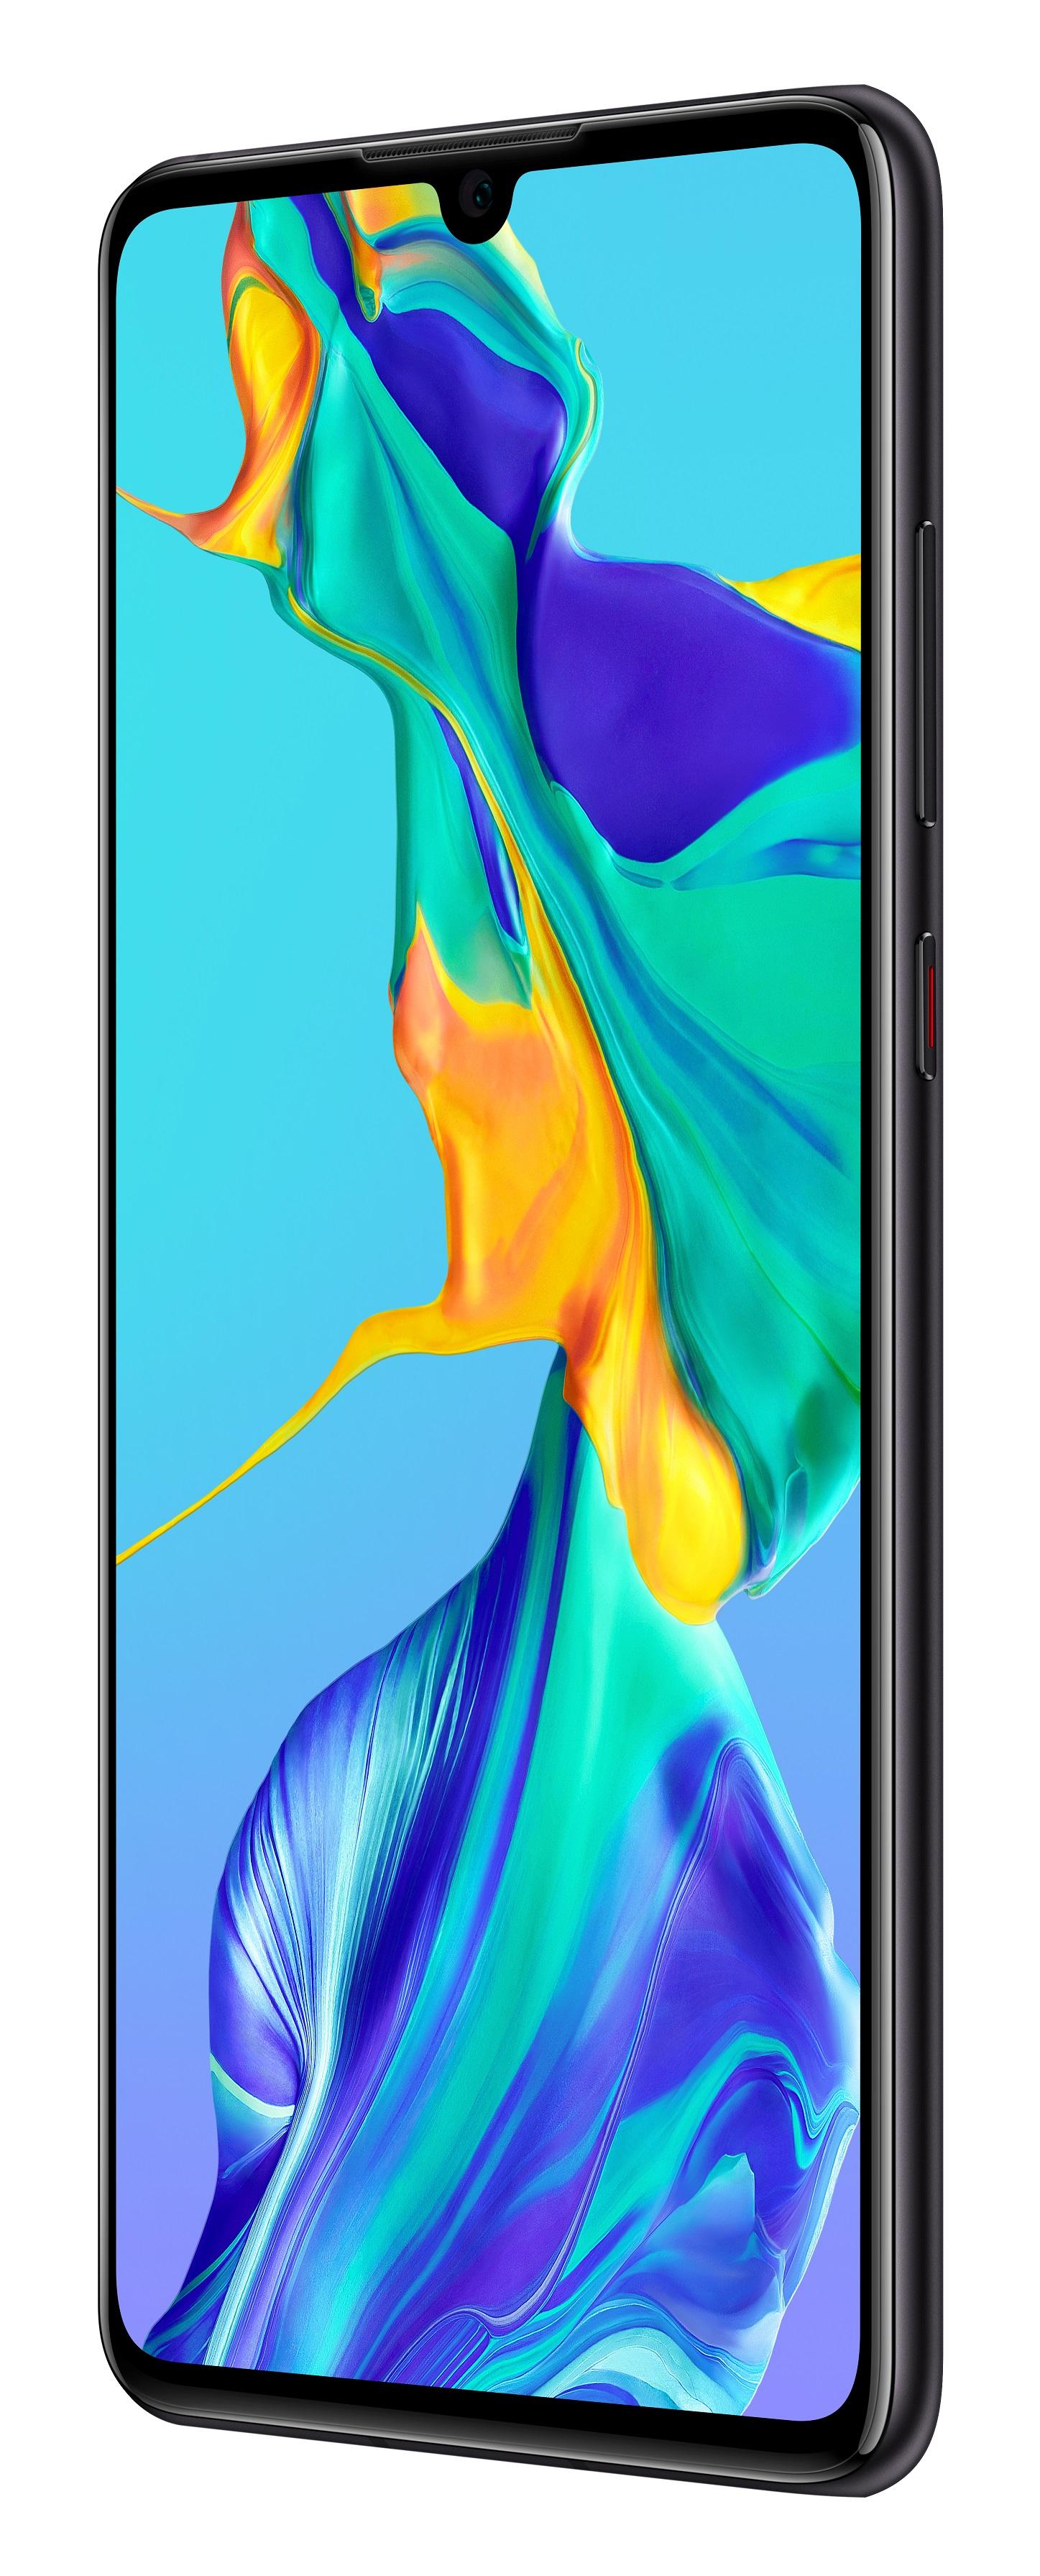 Huawei P30 schwarz - Dual SIM, Android 9.0 (Pie), OLED-Display, BRANDNEU